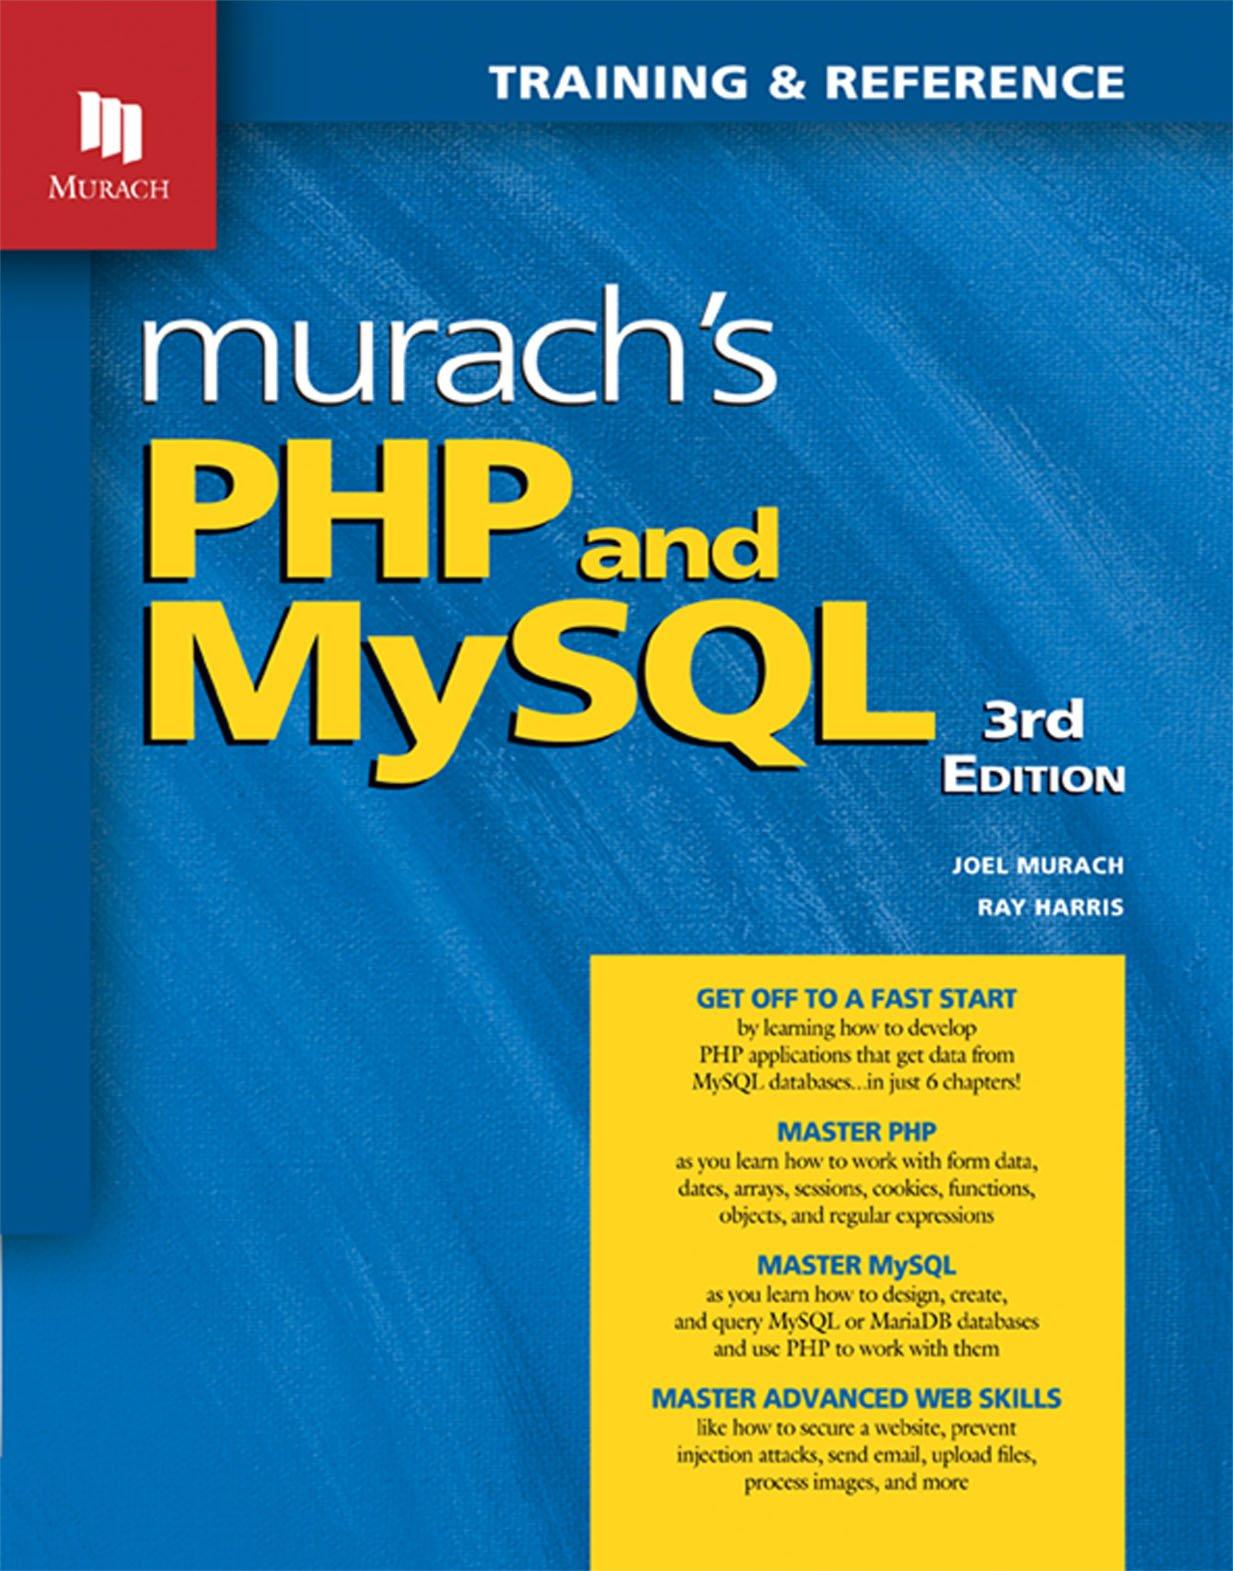 Murach's PHP and MySQL (3rd Edition) by Mike Murach & Associates